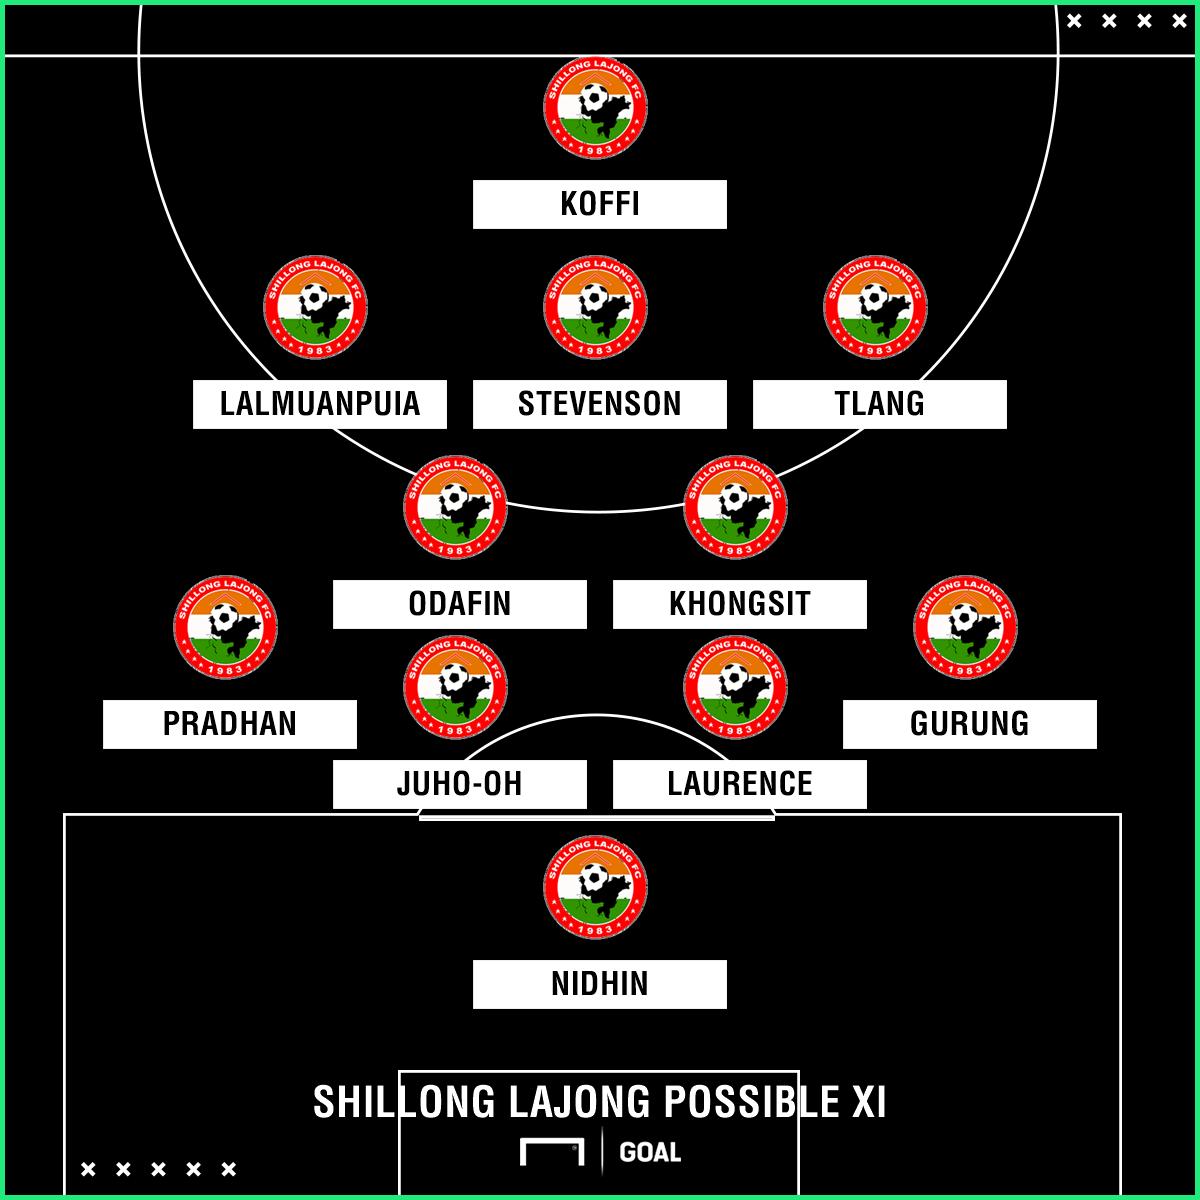 Shillong Lajong possible XI